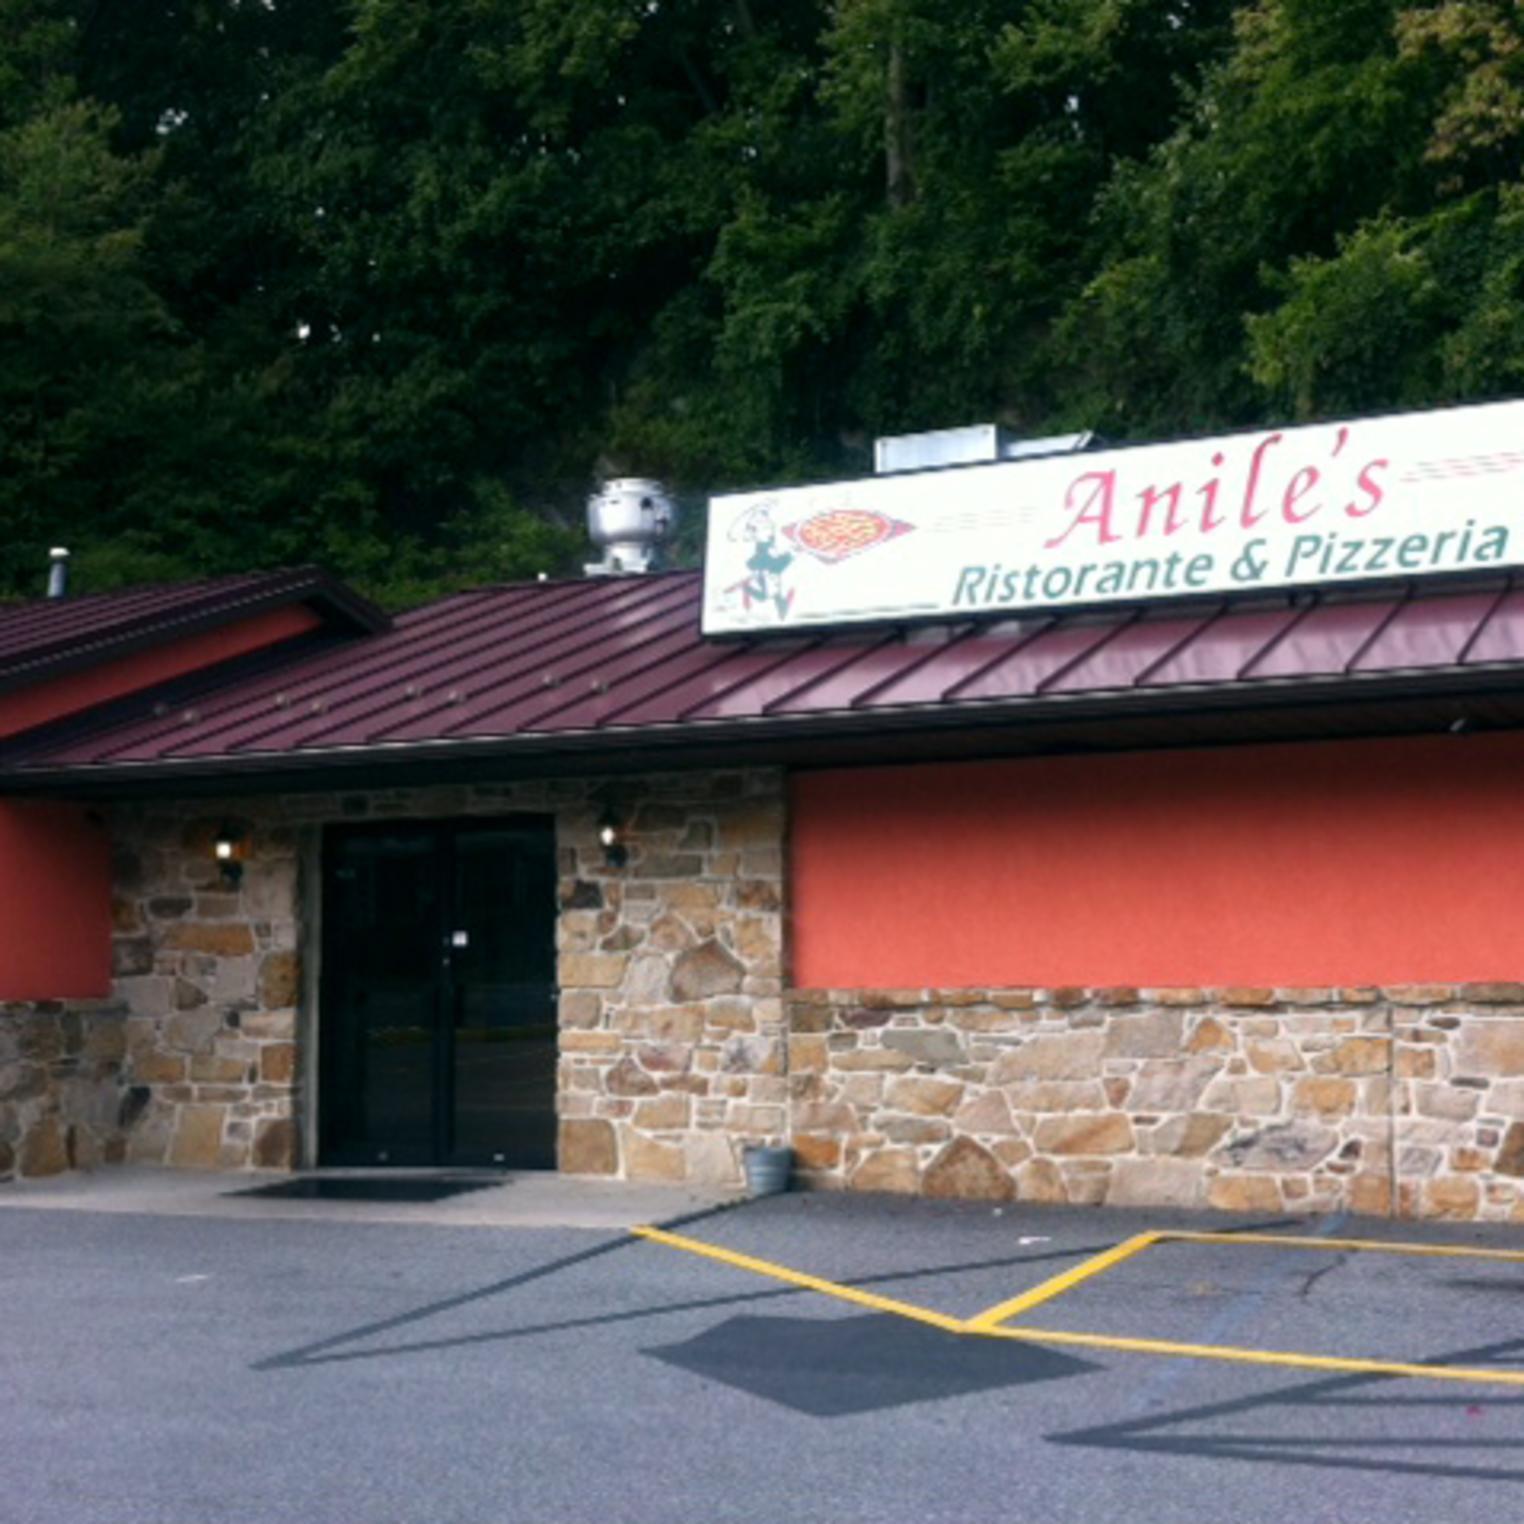 Anile's Ristoranted & Pizzeria